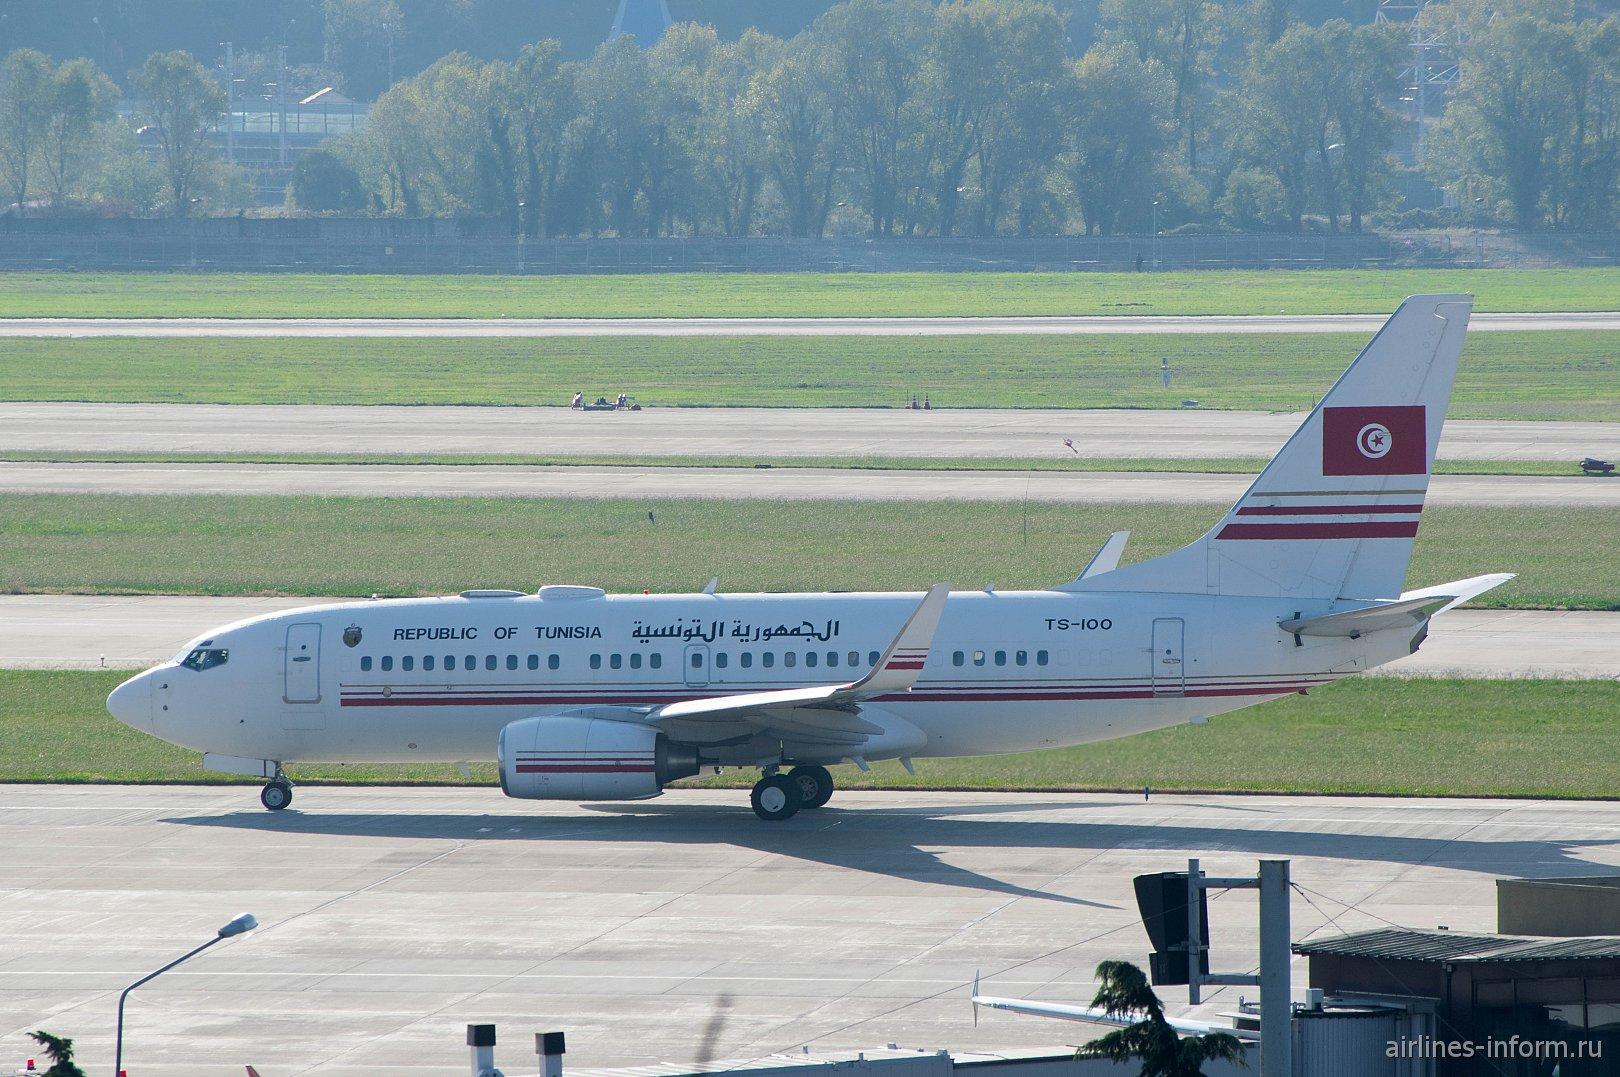 Самолет Боинг-737-700 (BBJ), номер TS-IOO, правительства Туниса в аэропорту Сочи